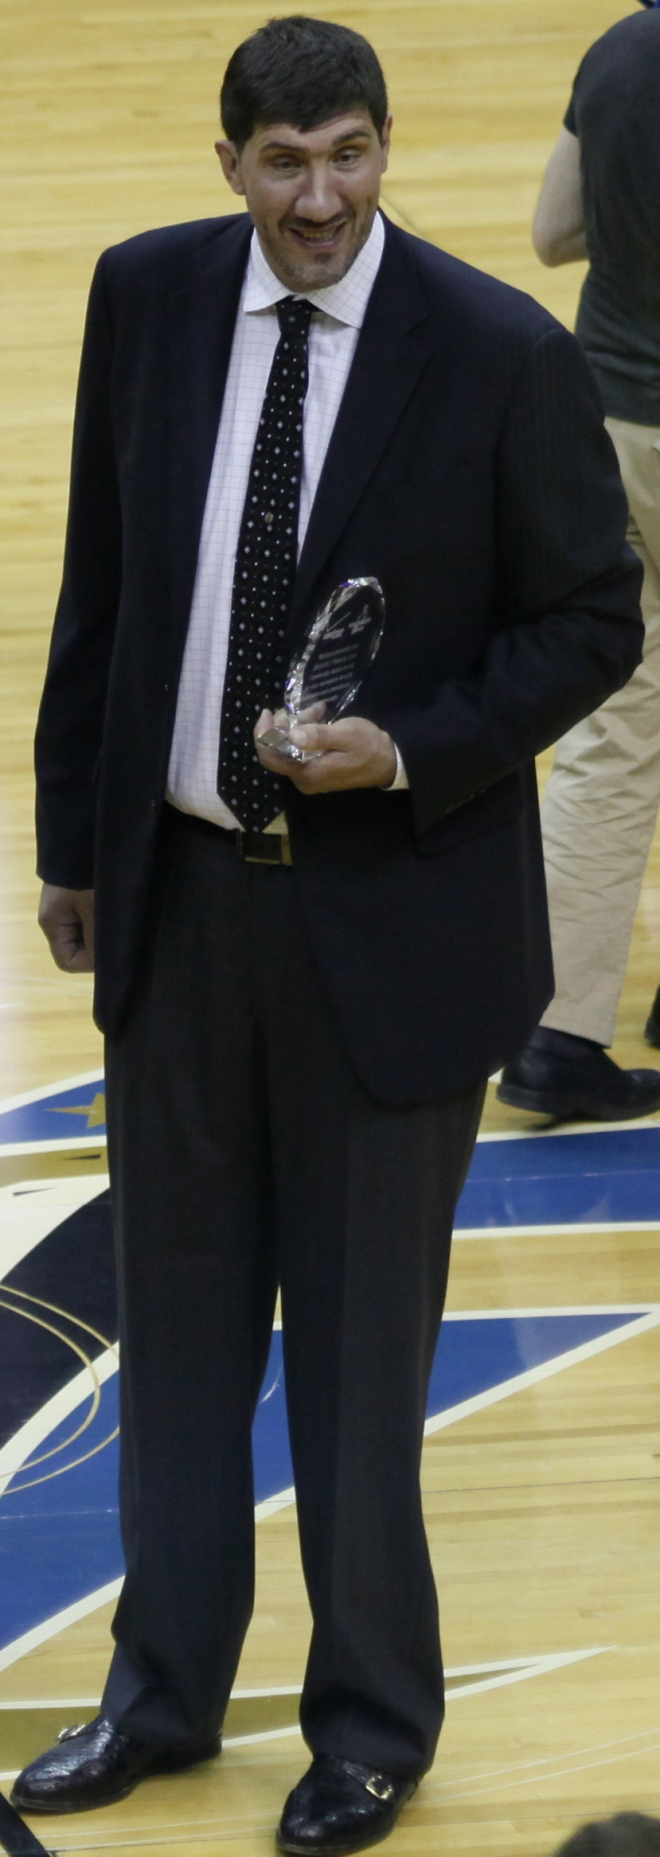 Gheorghe Muresan